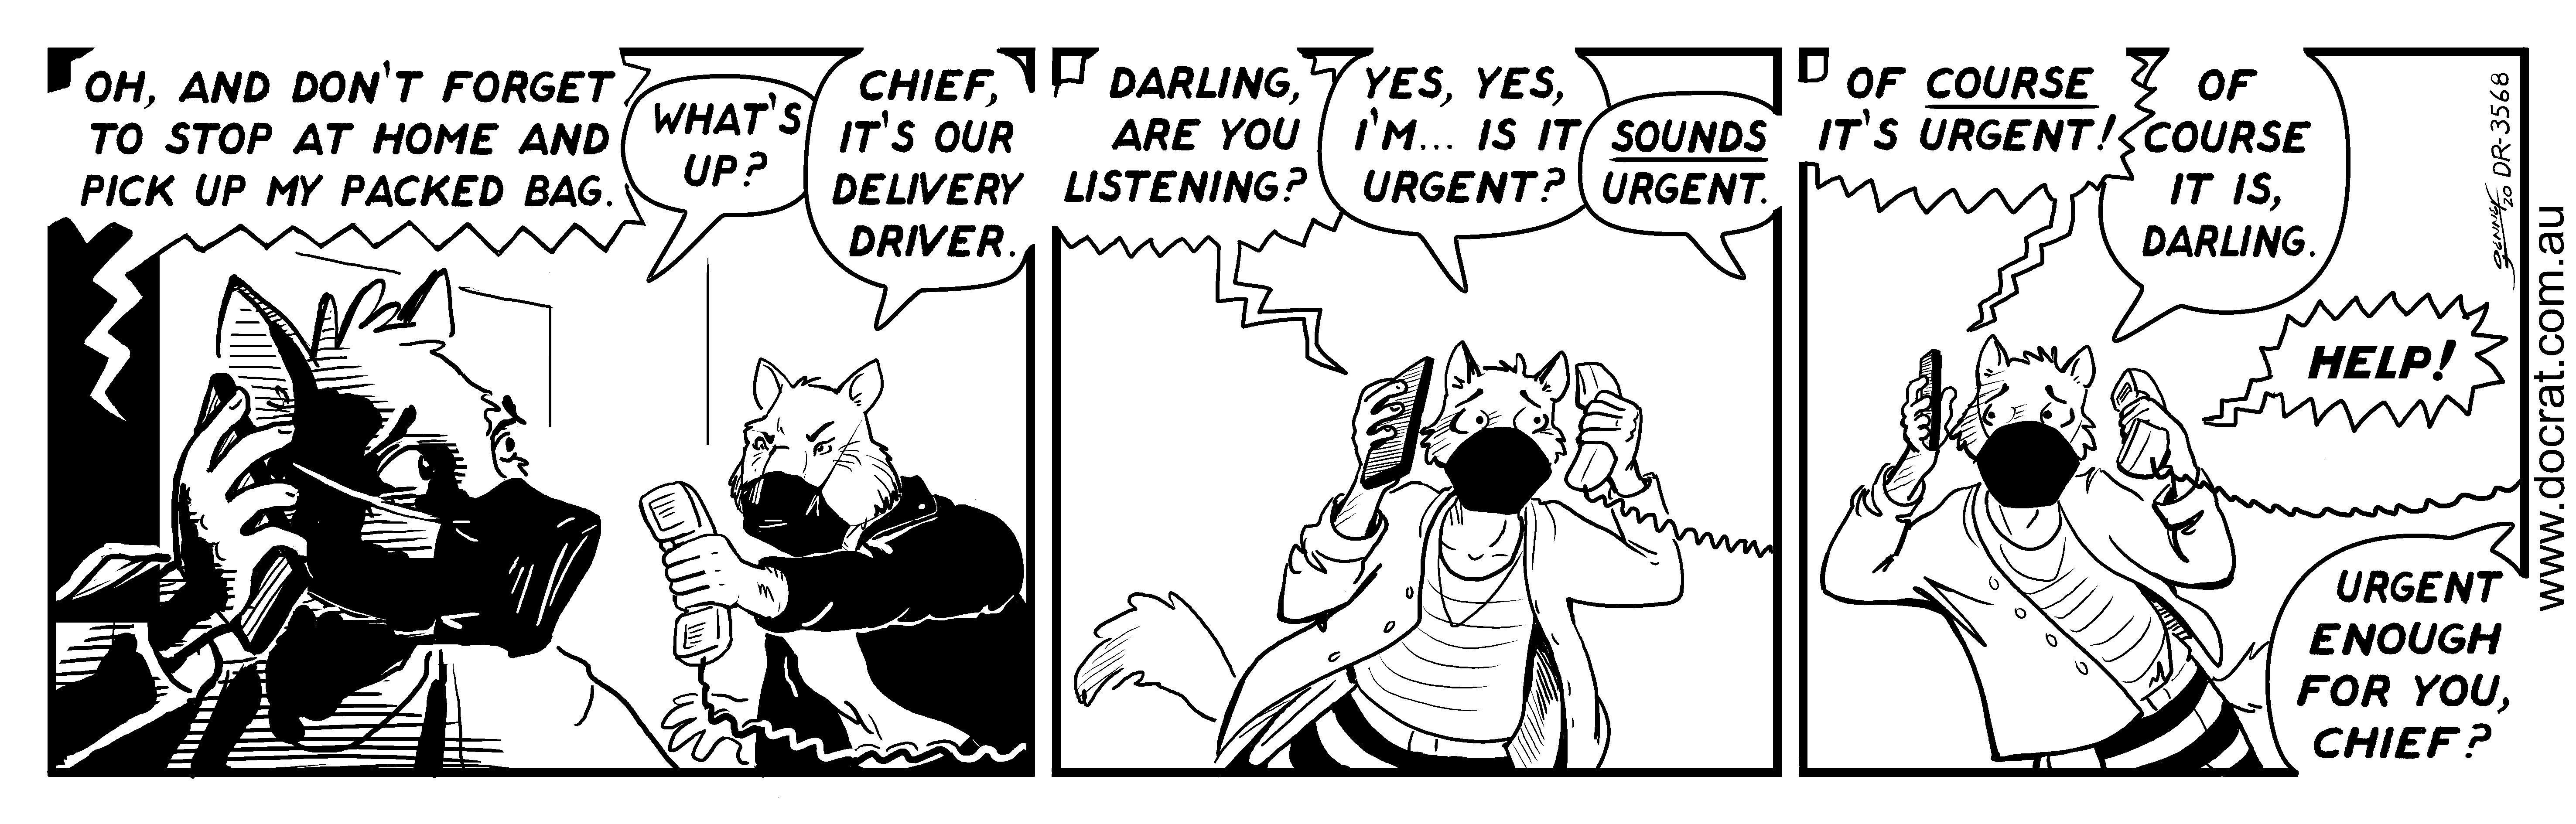 20200916